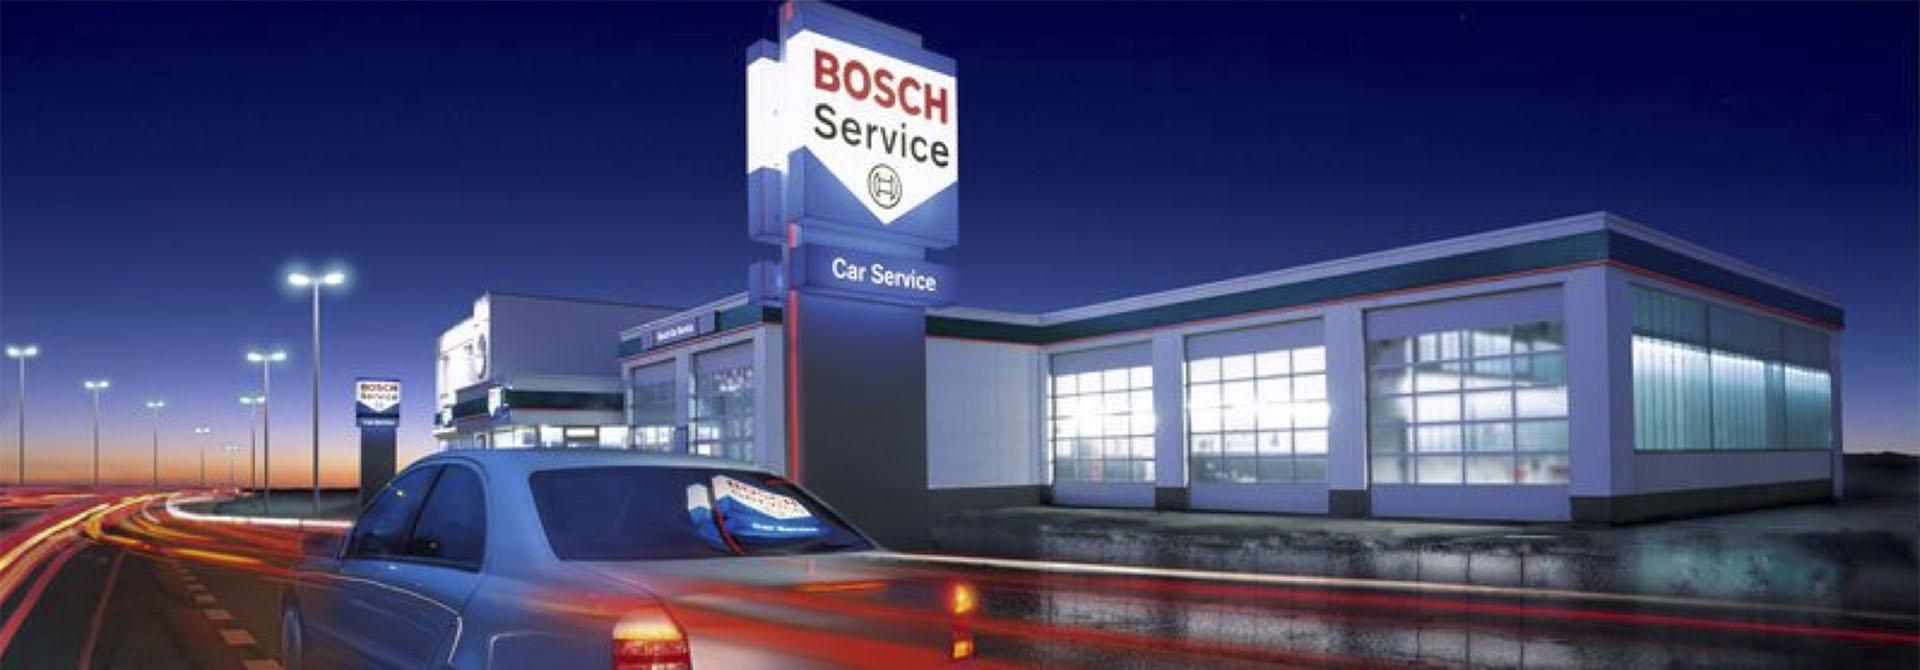 Boch Car Service